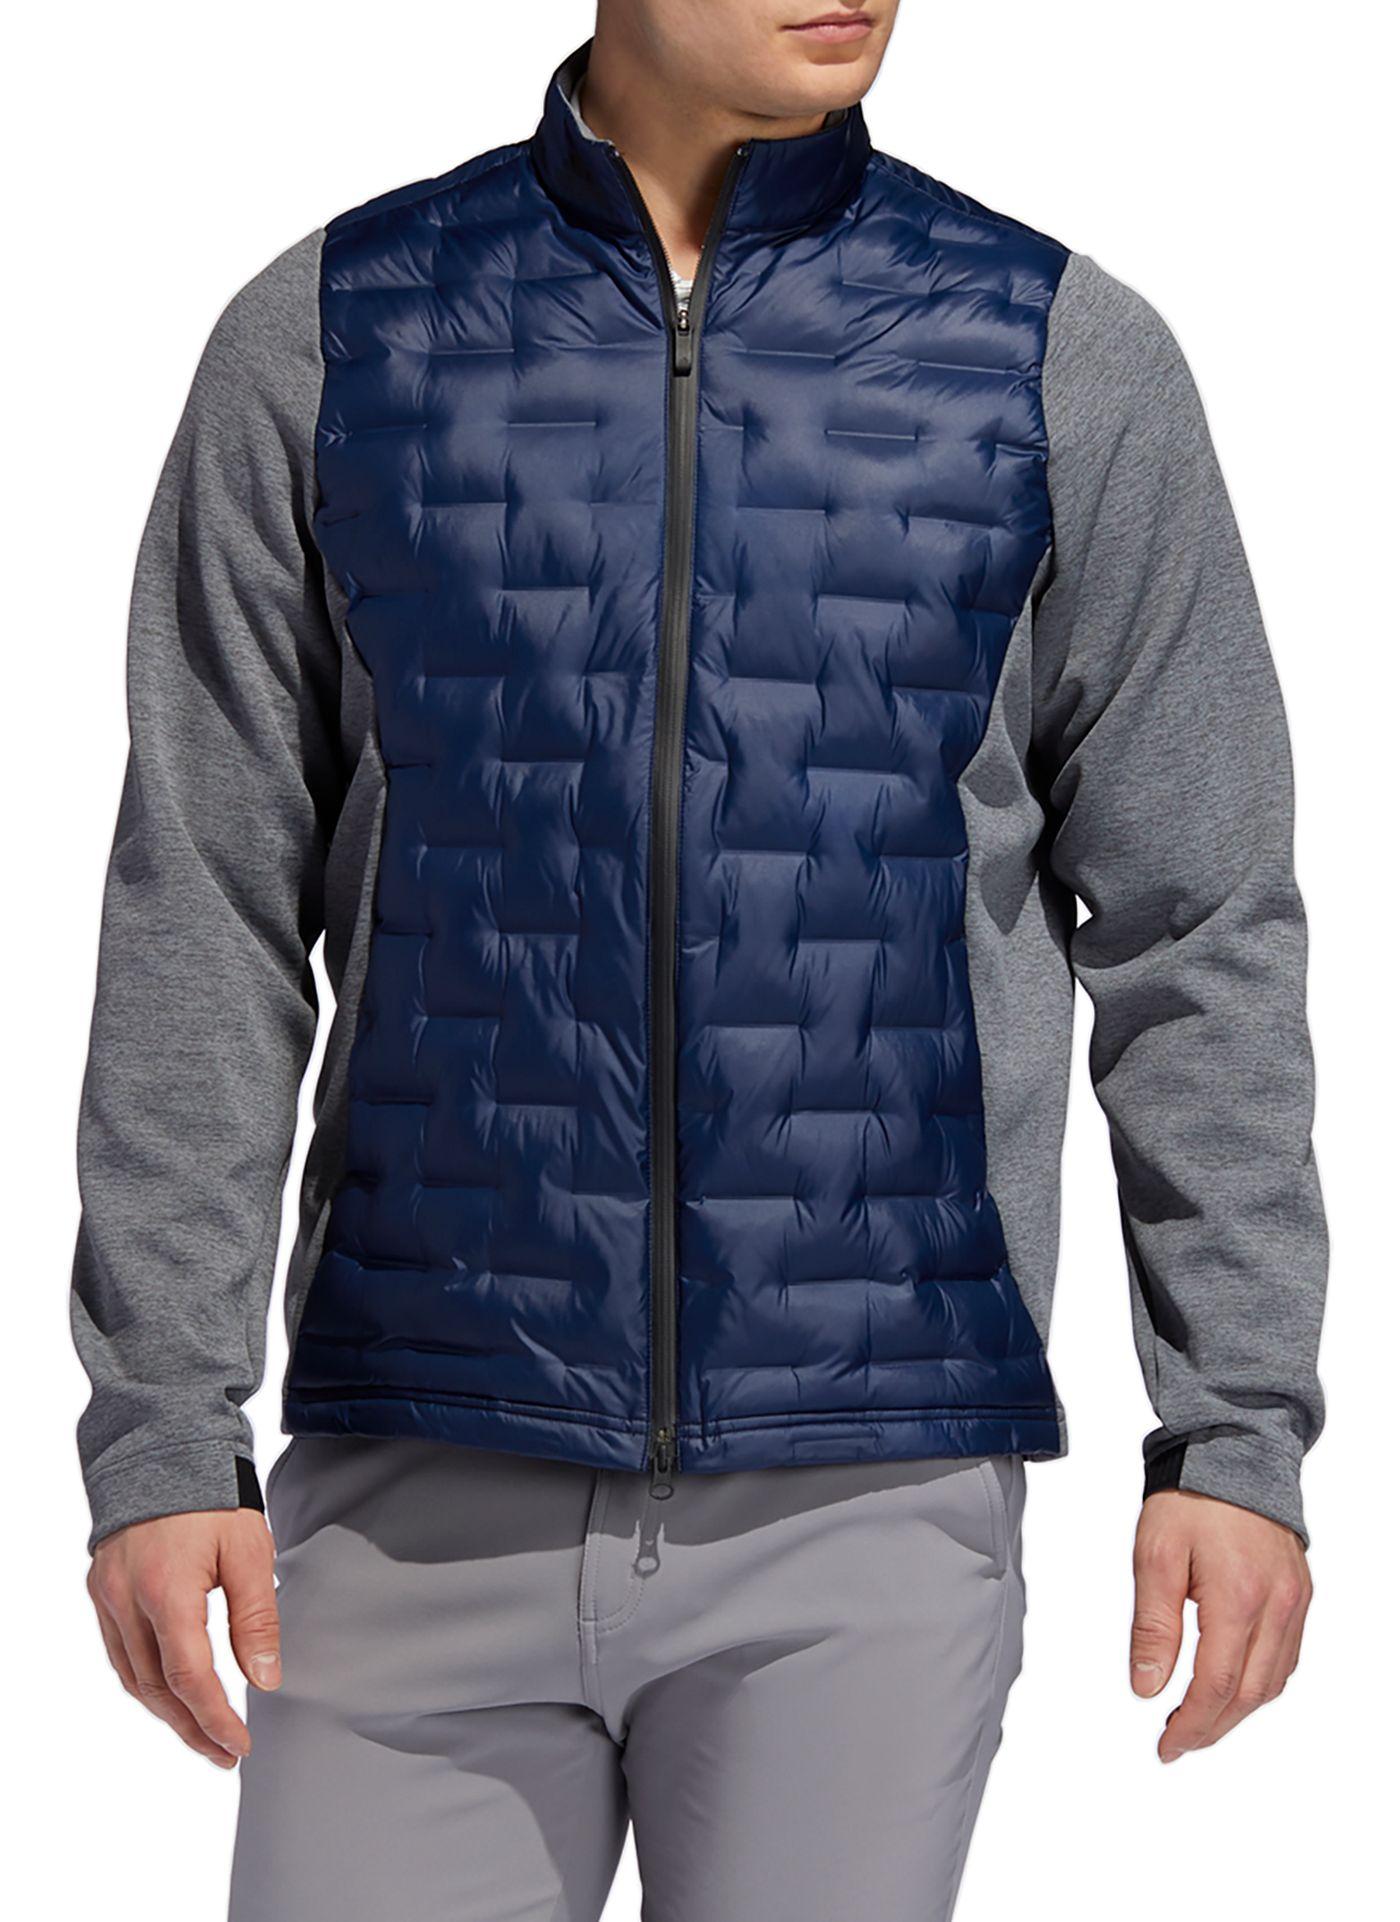 adidas Men's Frostguard Insulated Golf Jacket